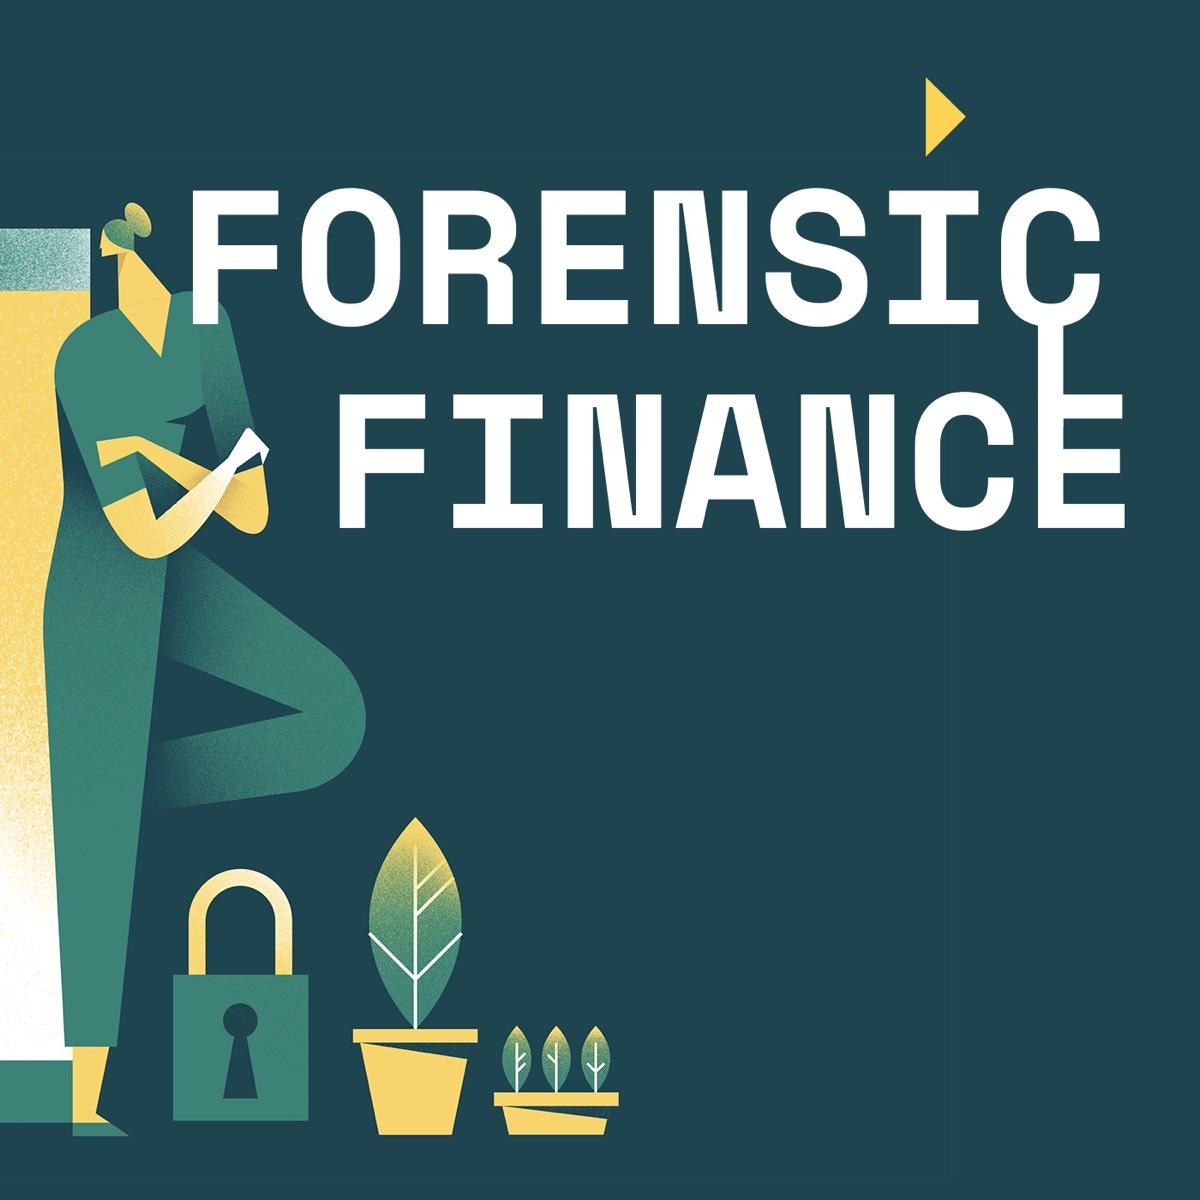 Forensic Finance